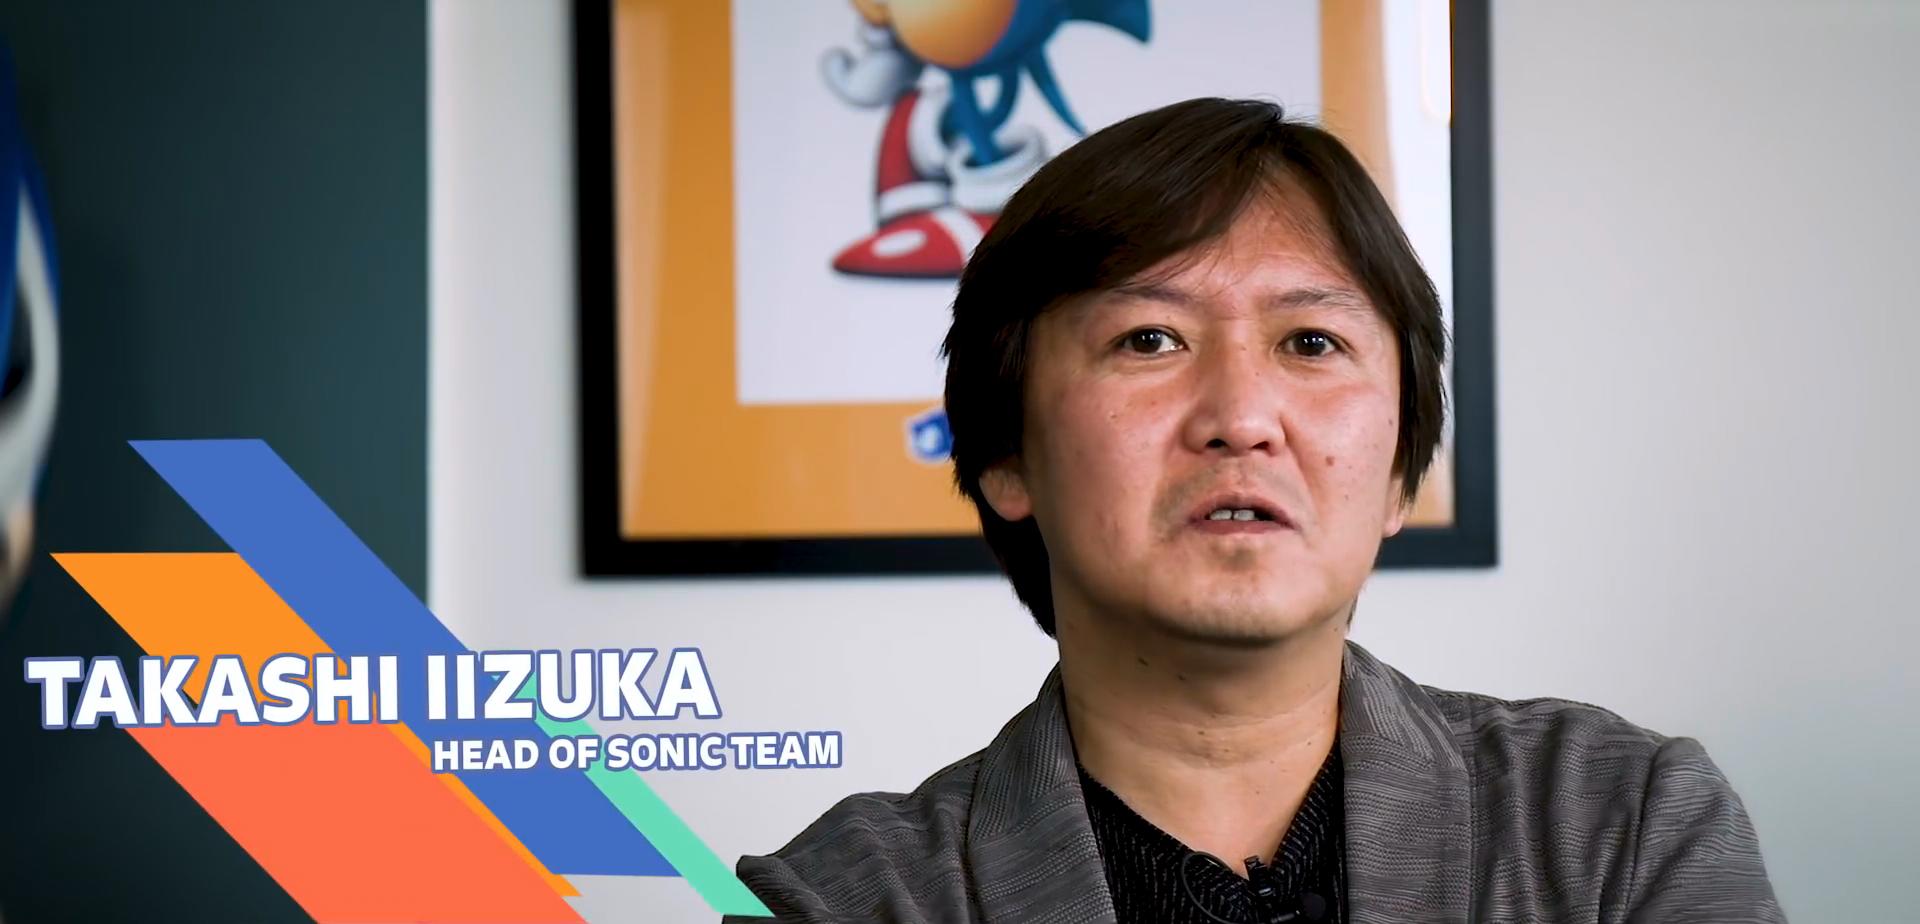 http://s8.picofile.com/file/8346575642/Takashi_Iizuka.jpg